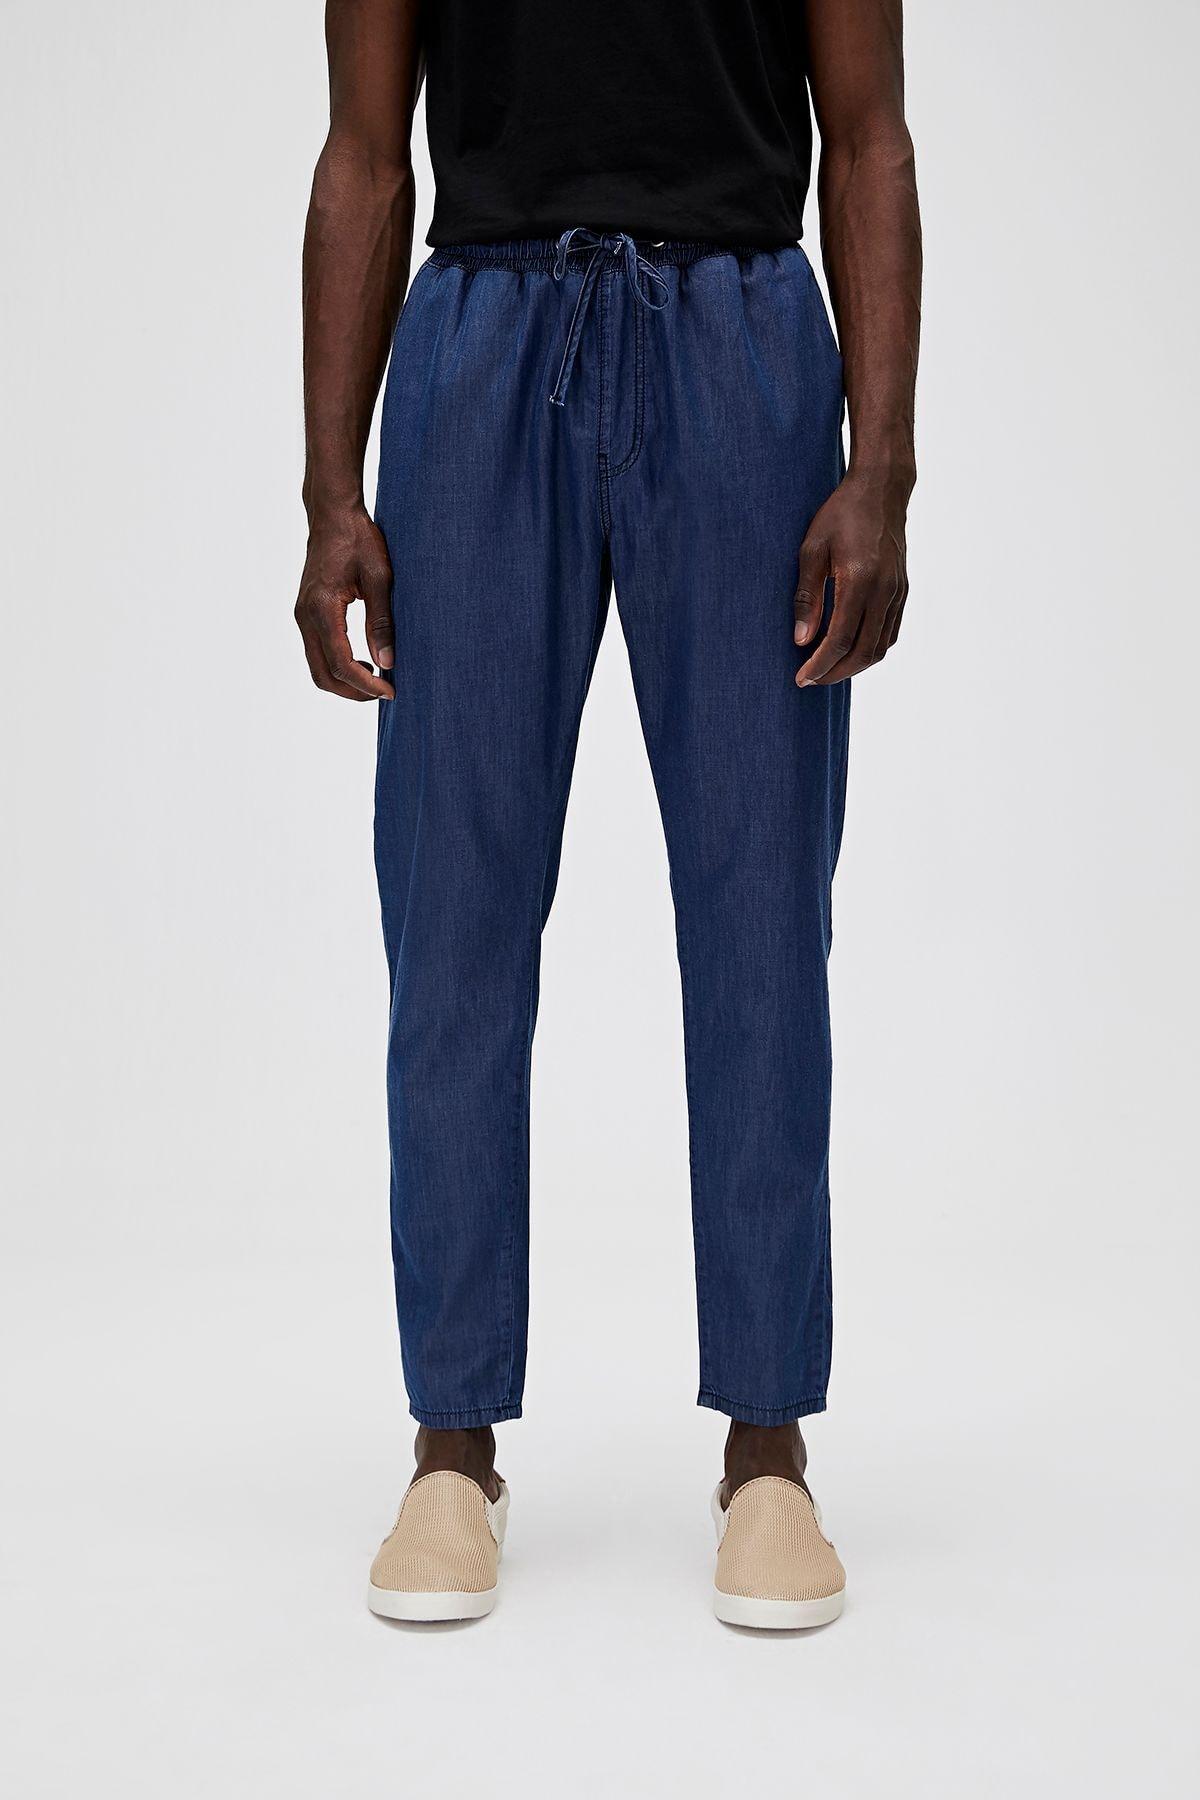 Bad Bear Erkek Mavi Chino İnce Kumaş Pantolon 20.01.16.003 1